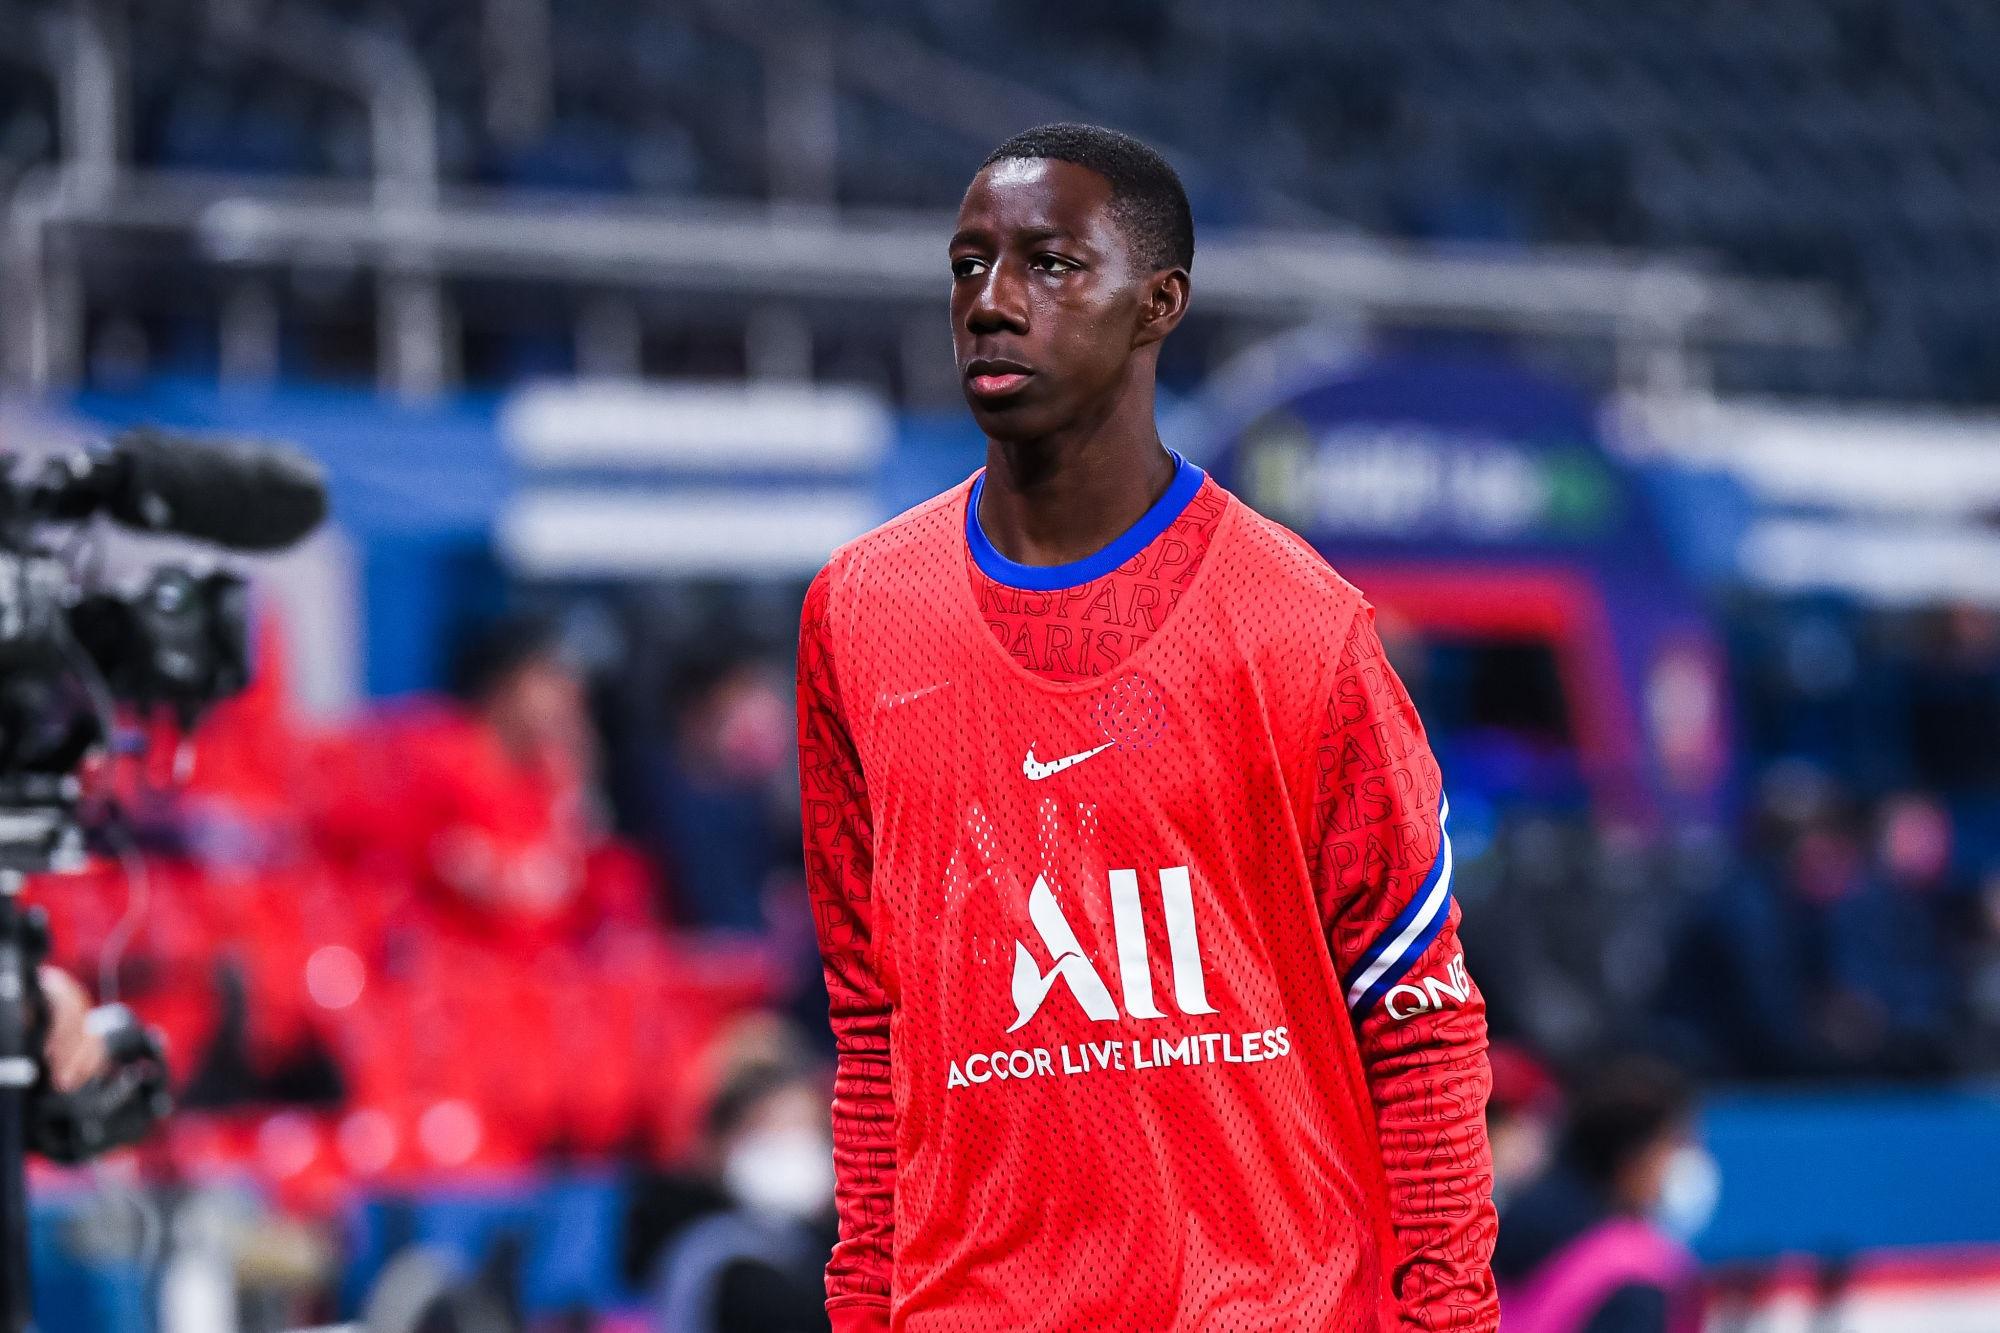 Mercato - Brest pense au retour de Fadiga, selon Goal